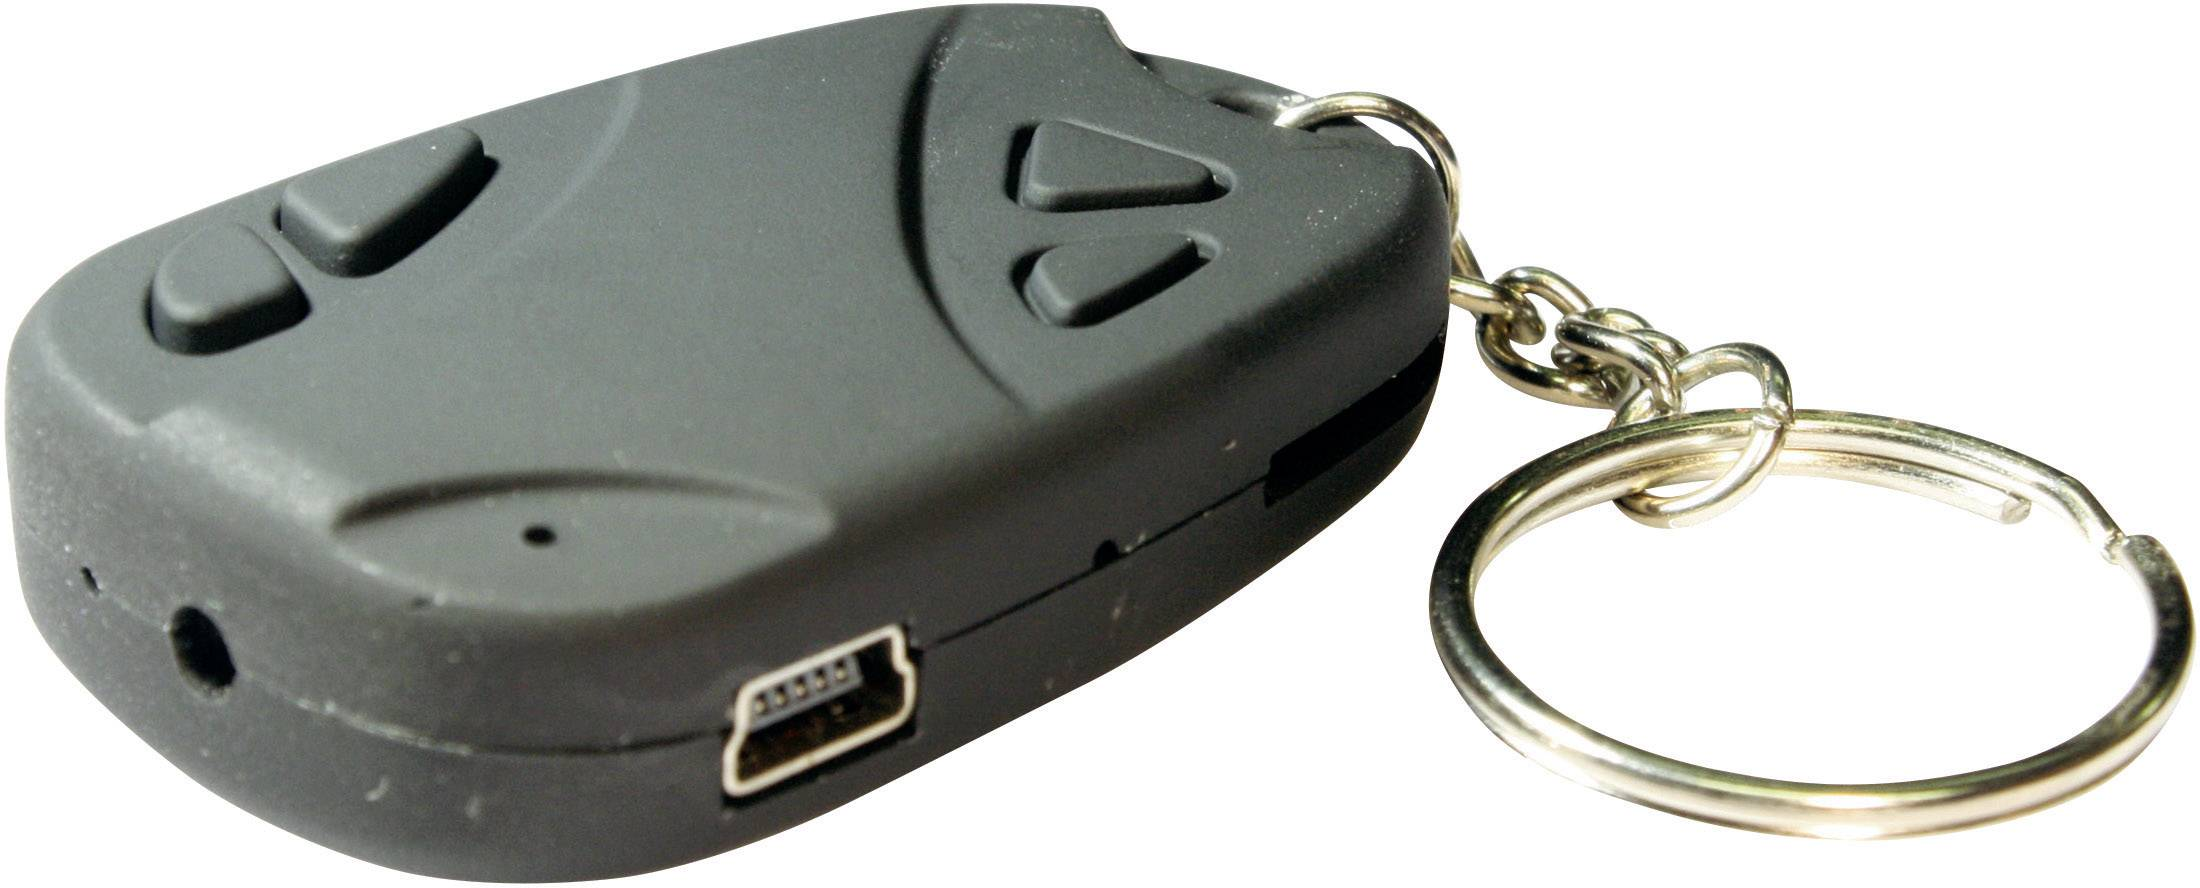 Mini kamera s príveskom BS KeyChain, 740 x 480 px